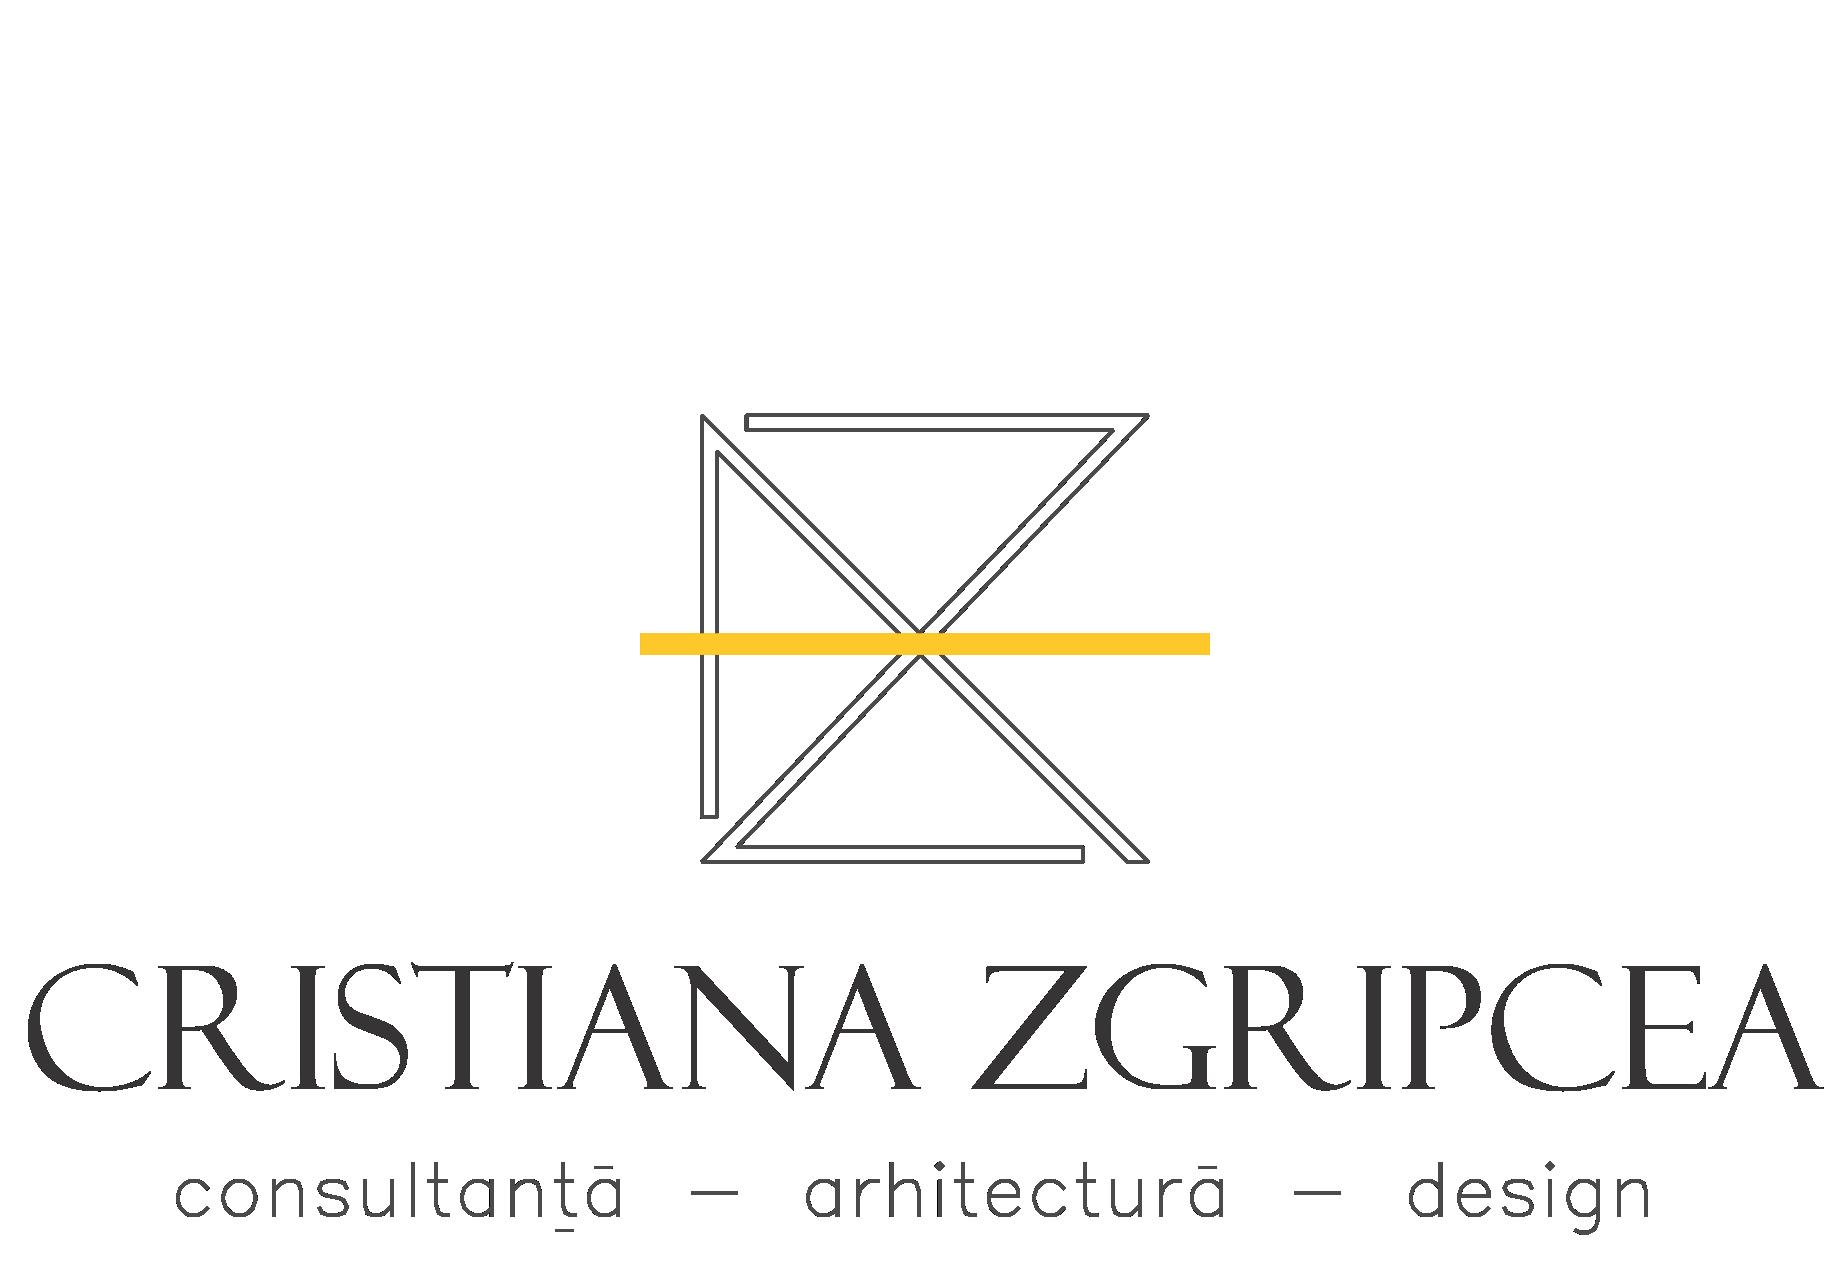 Cristiana Zgripcea